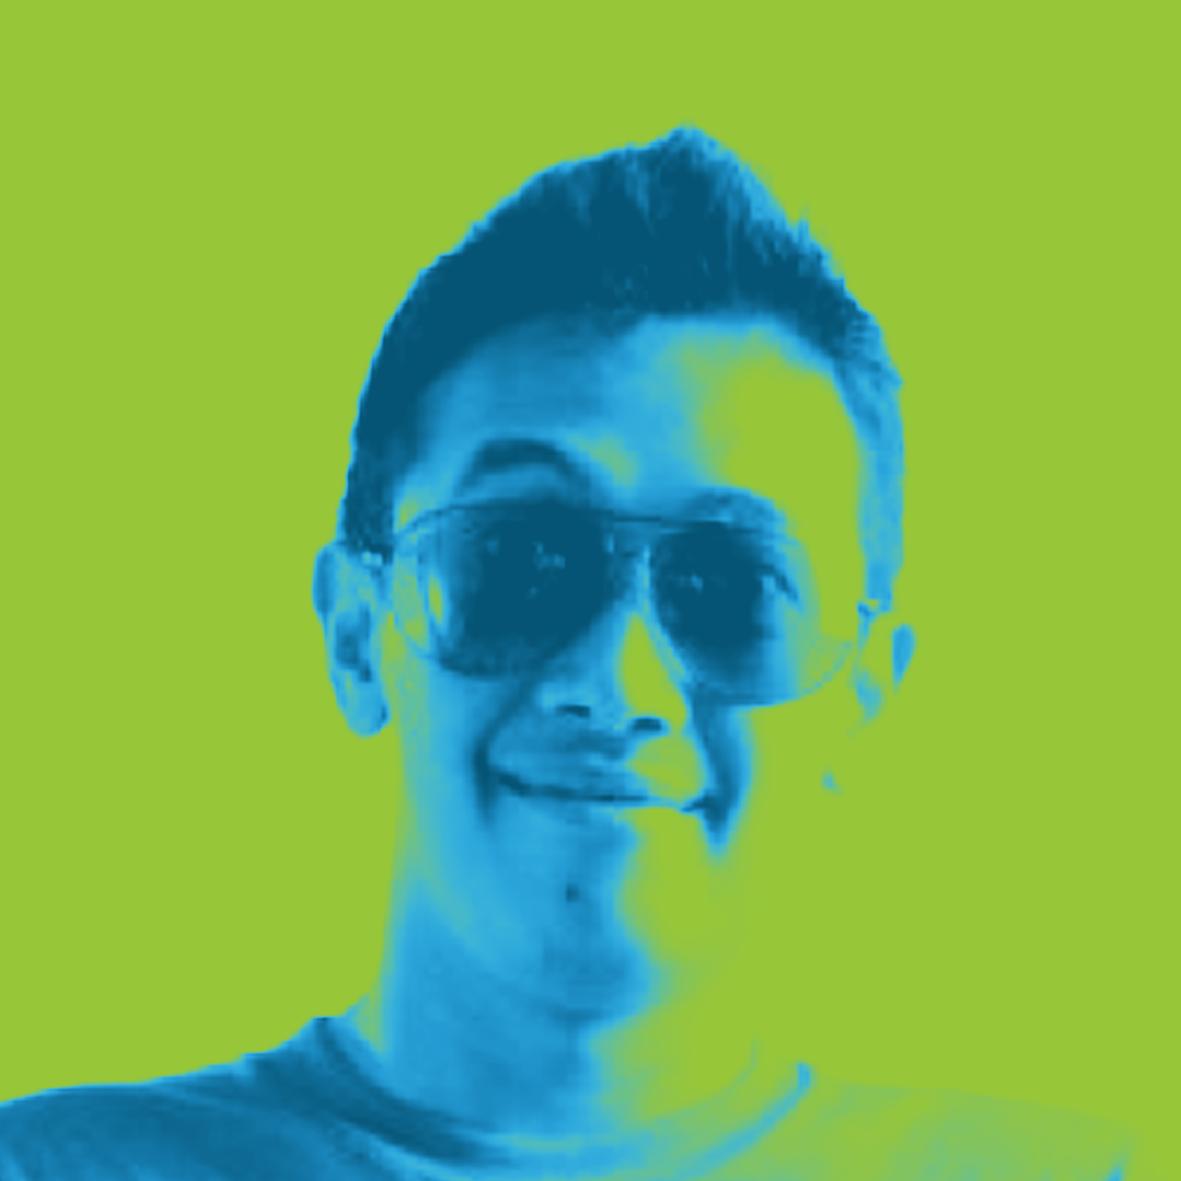 Jack Nusantara